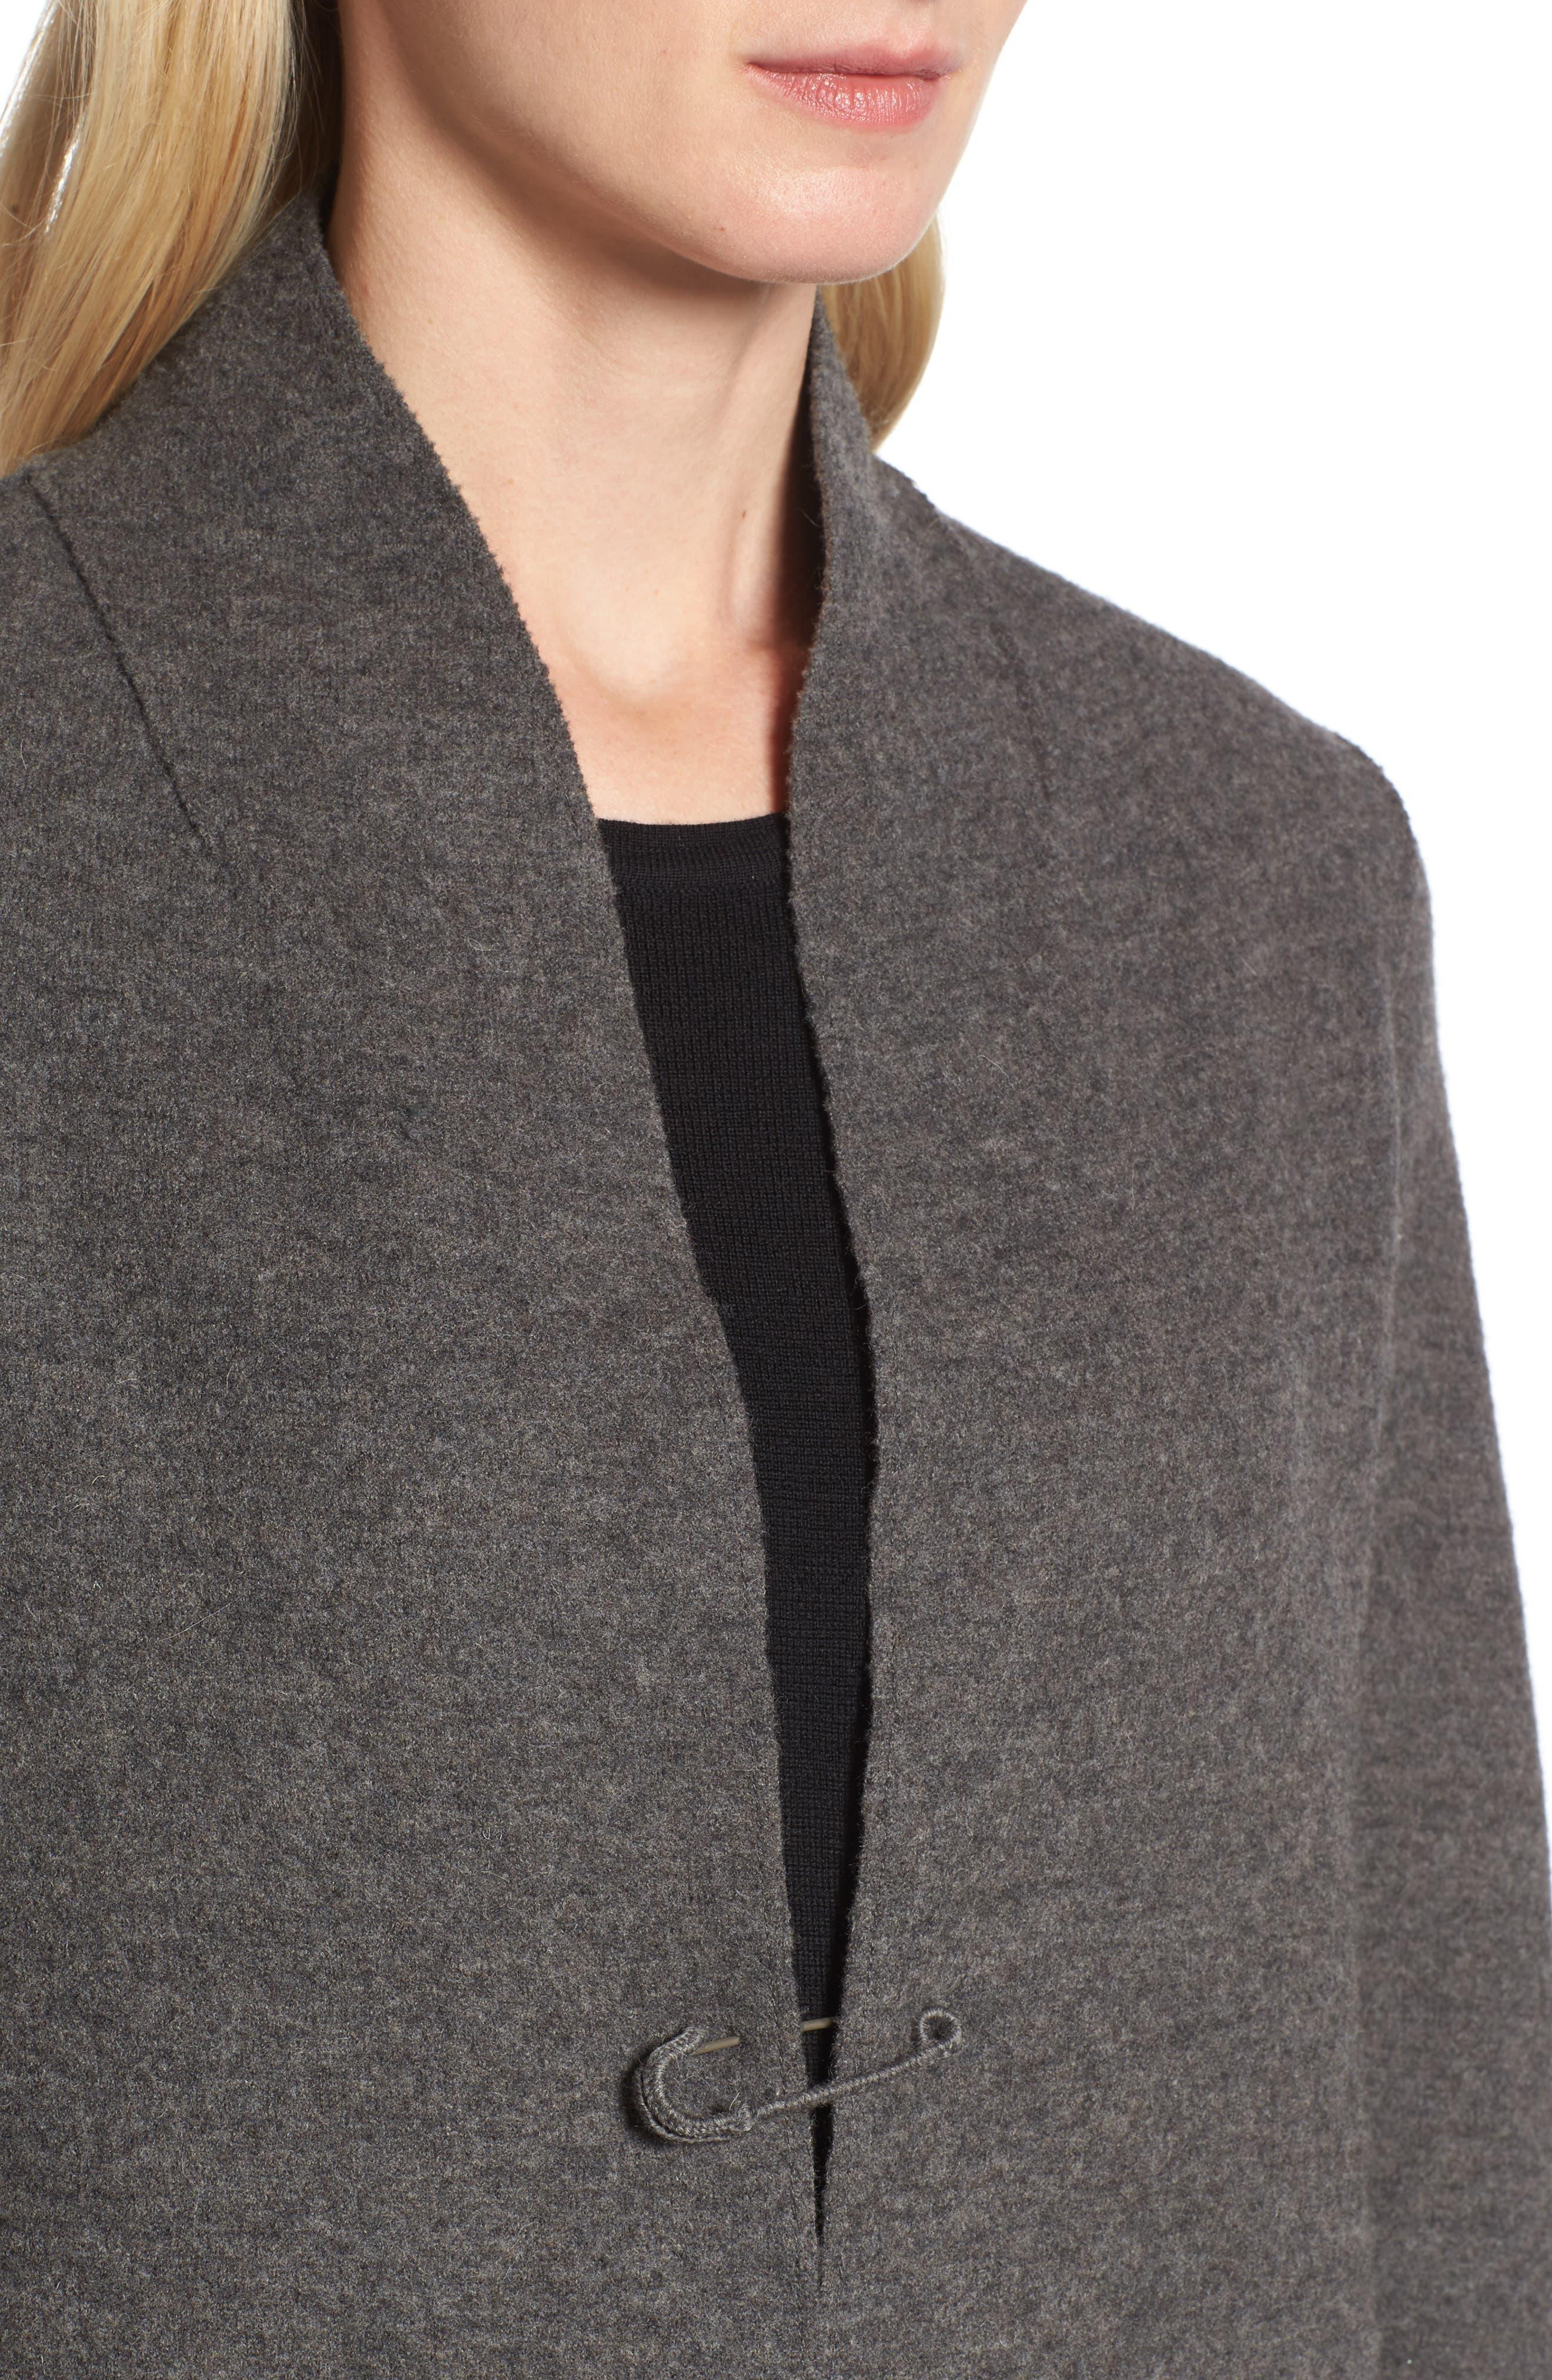 Boiled Wool Jacket,                             Alternate thumbnail 4, color,                             210